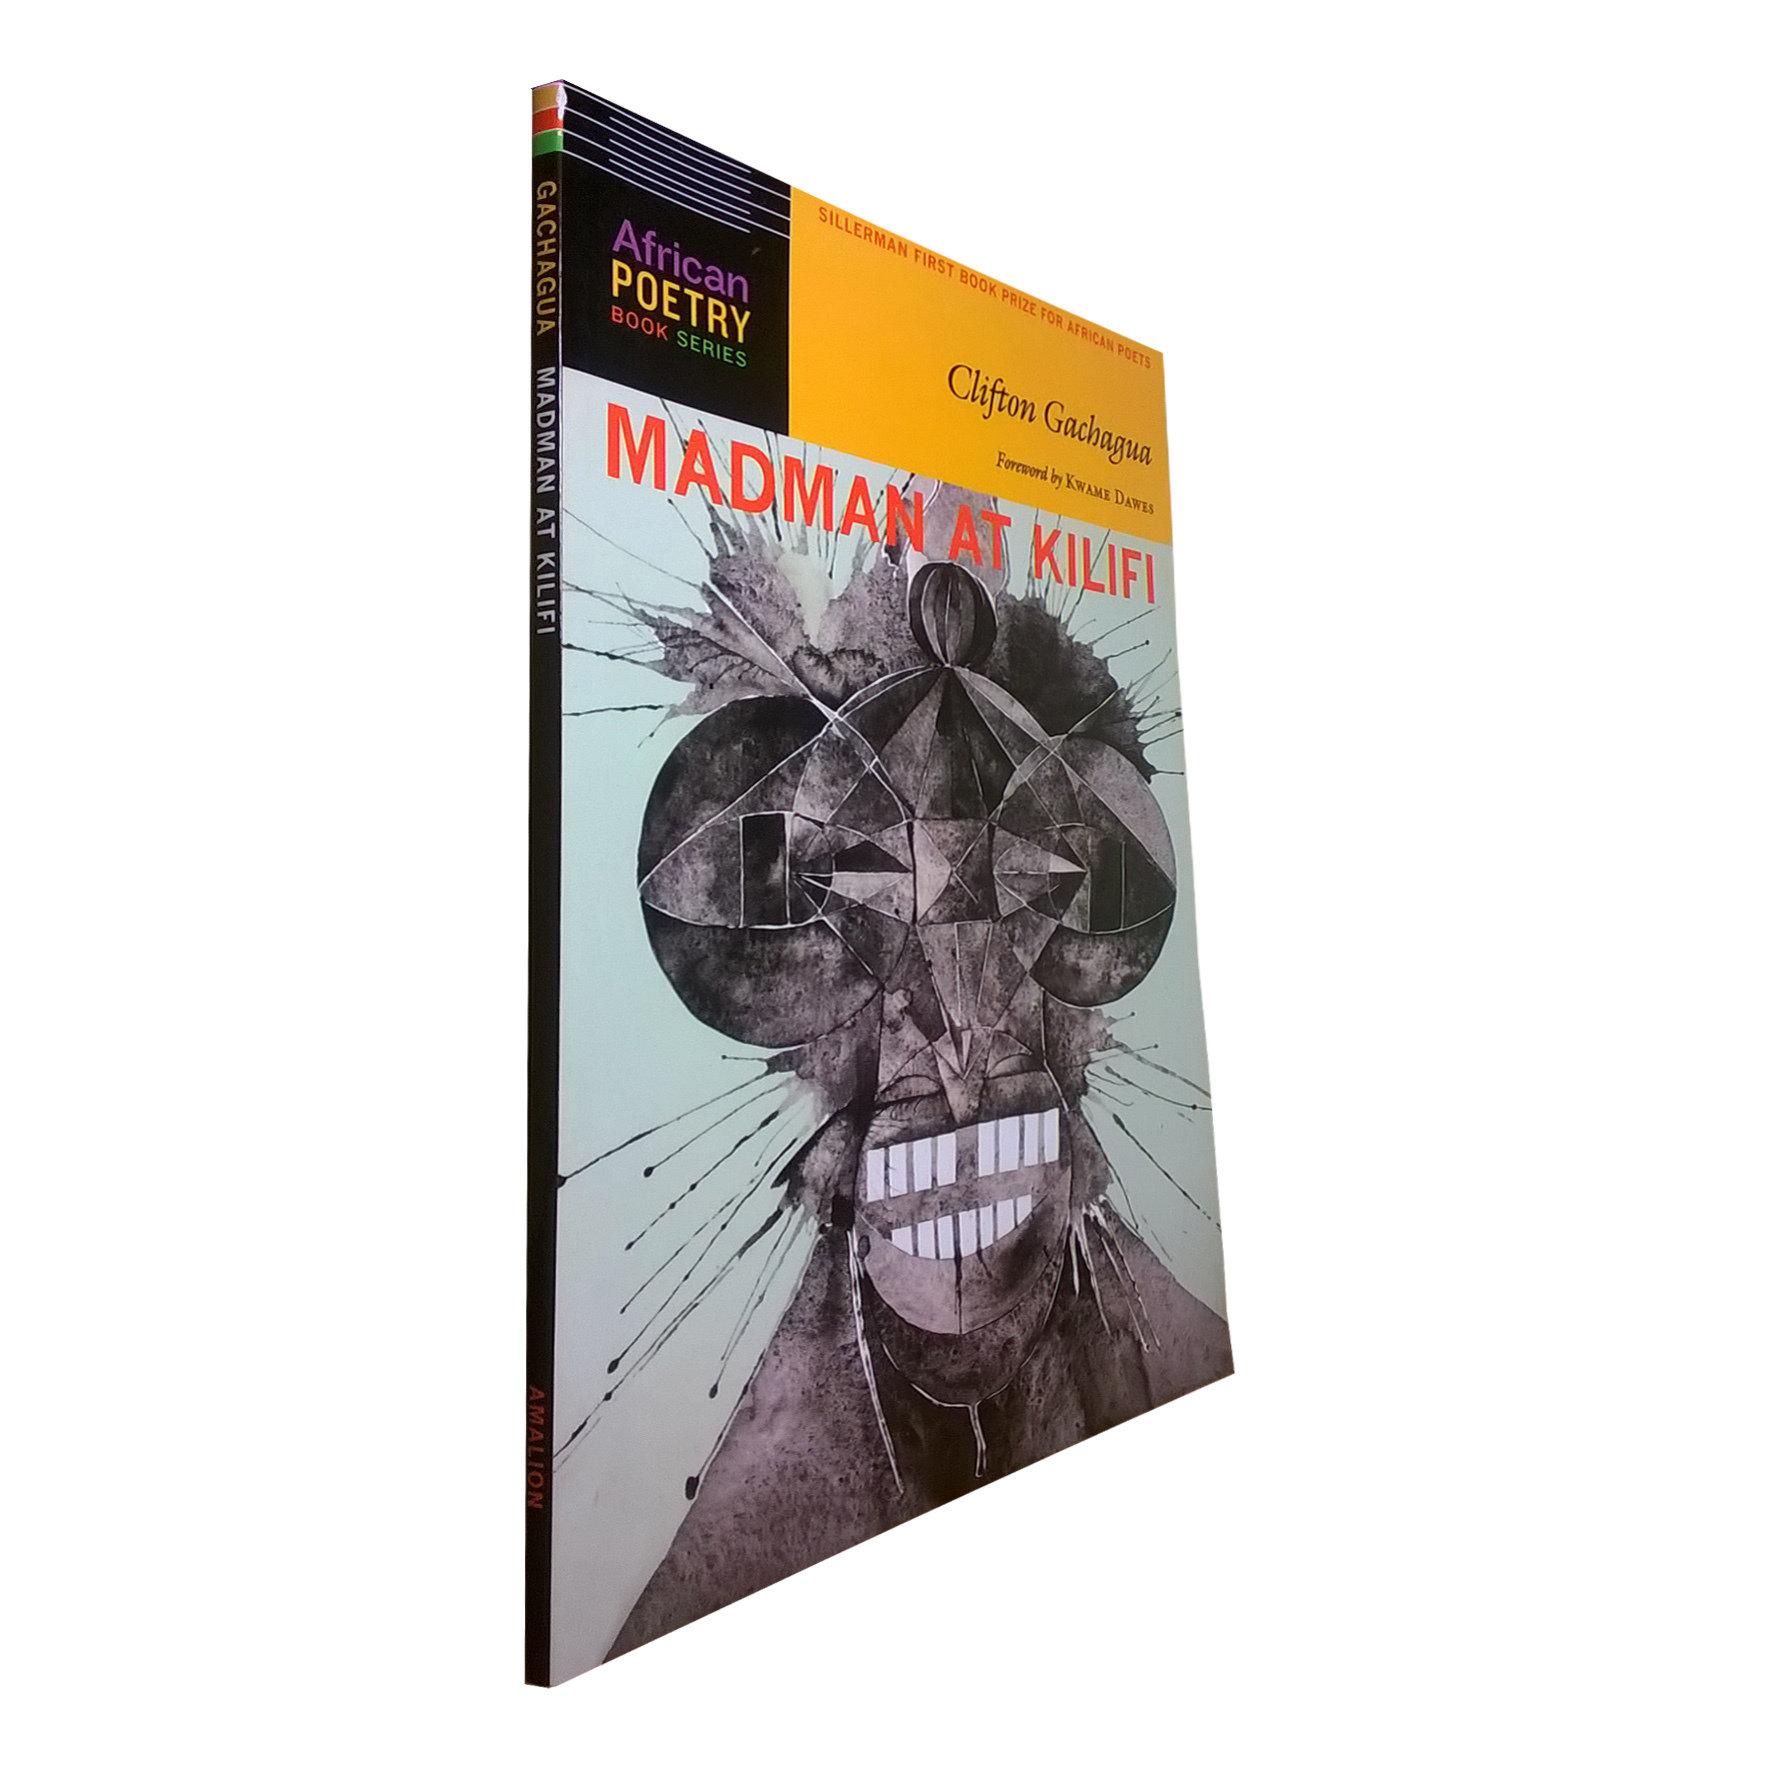 Madman at Kilifi by Clifton Gachagua (Amalion Publishing, 2014) CIR17